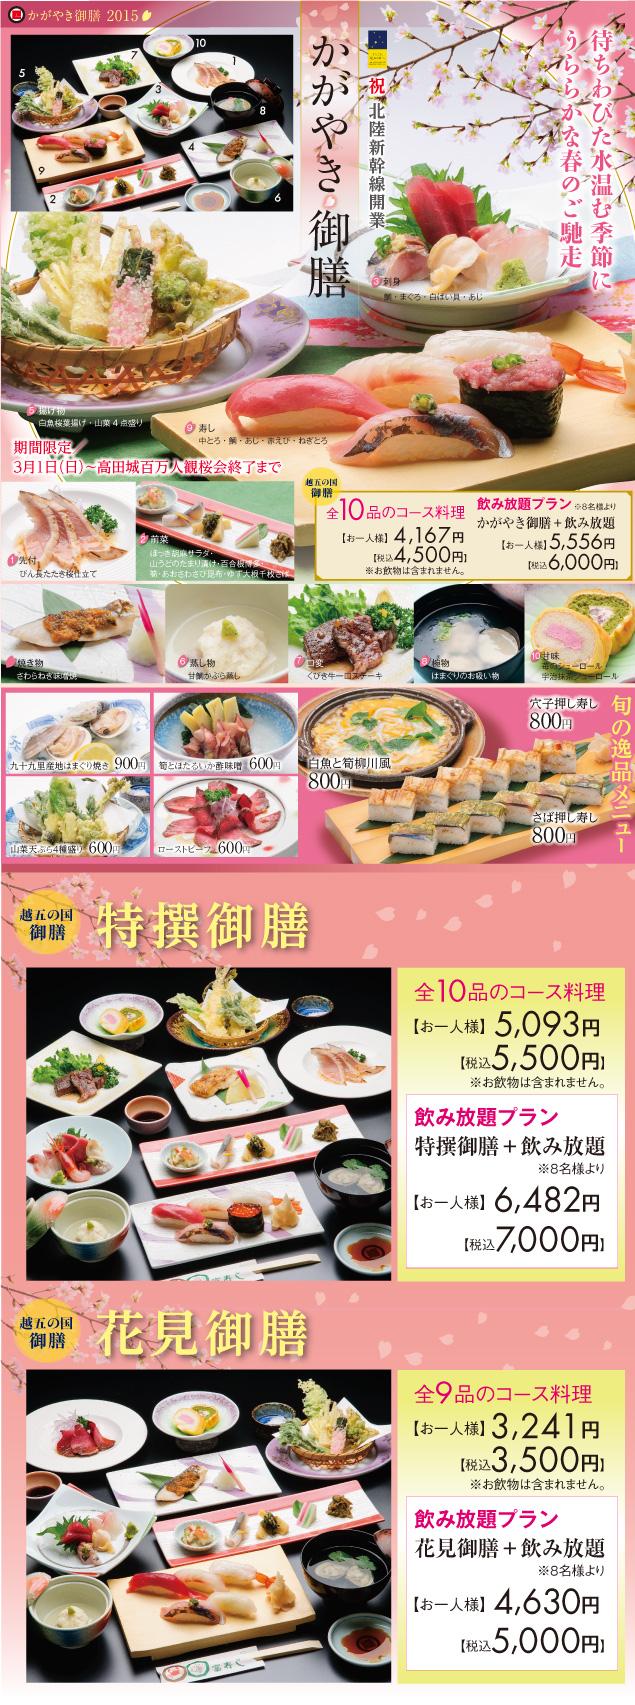 hanamigozen_150228_01.jpg